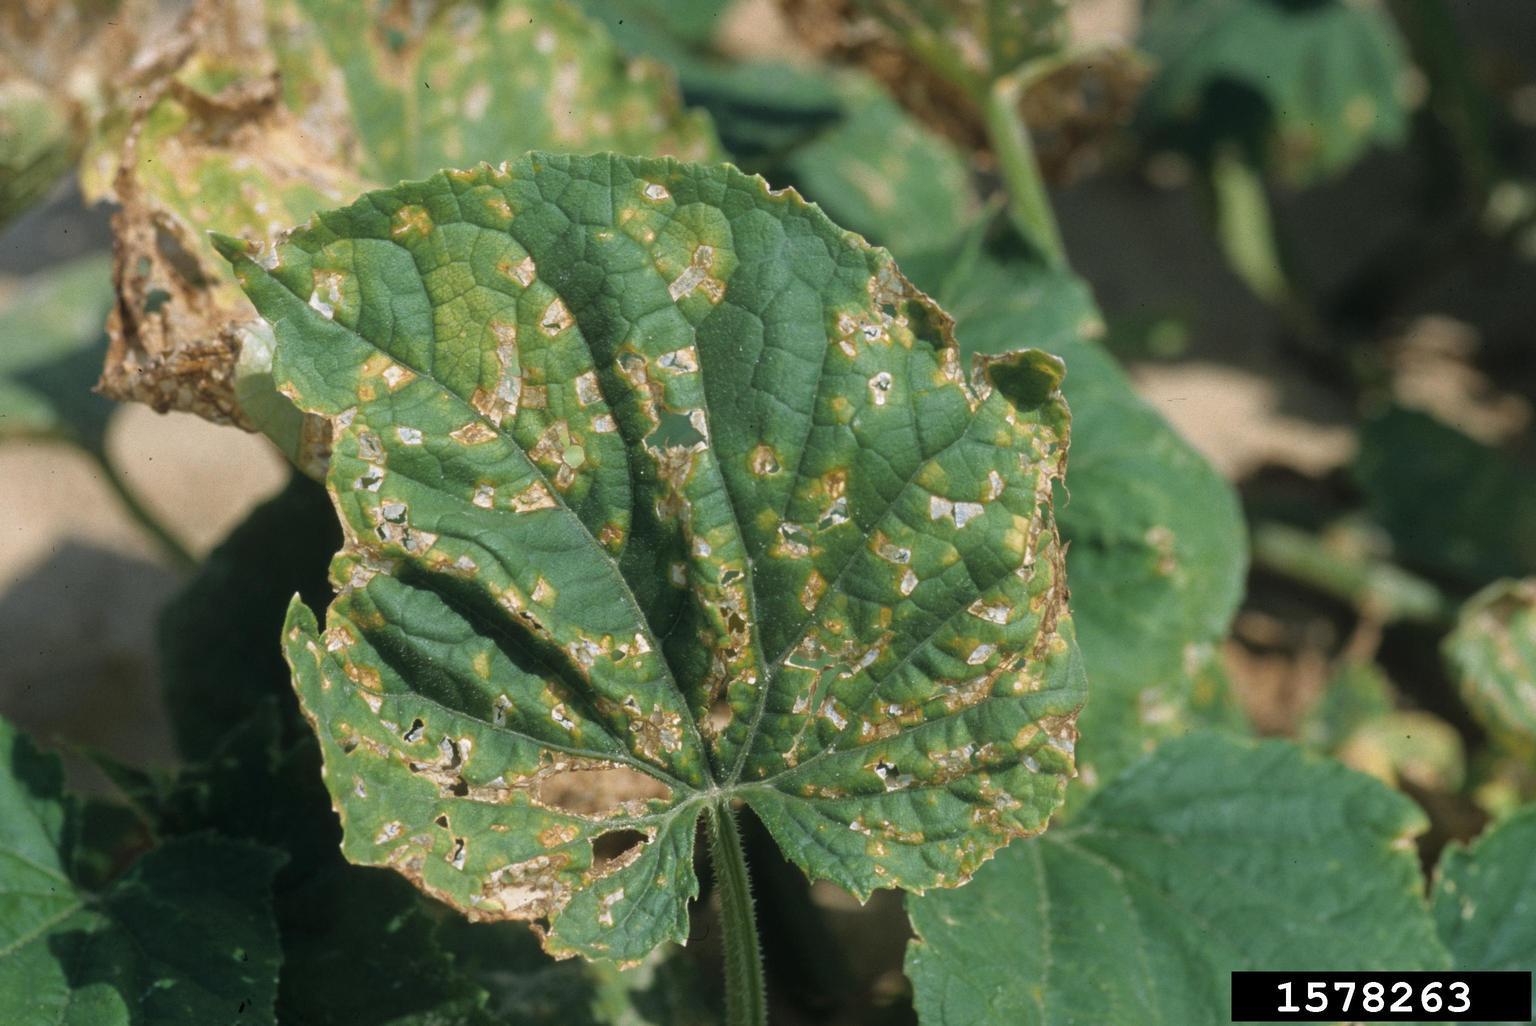 Angular Leaf Spot Of Cucumber Pseudomonas Syringae Pv